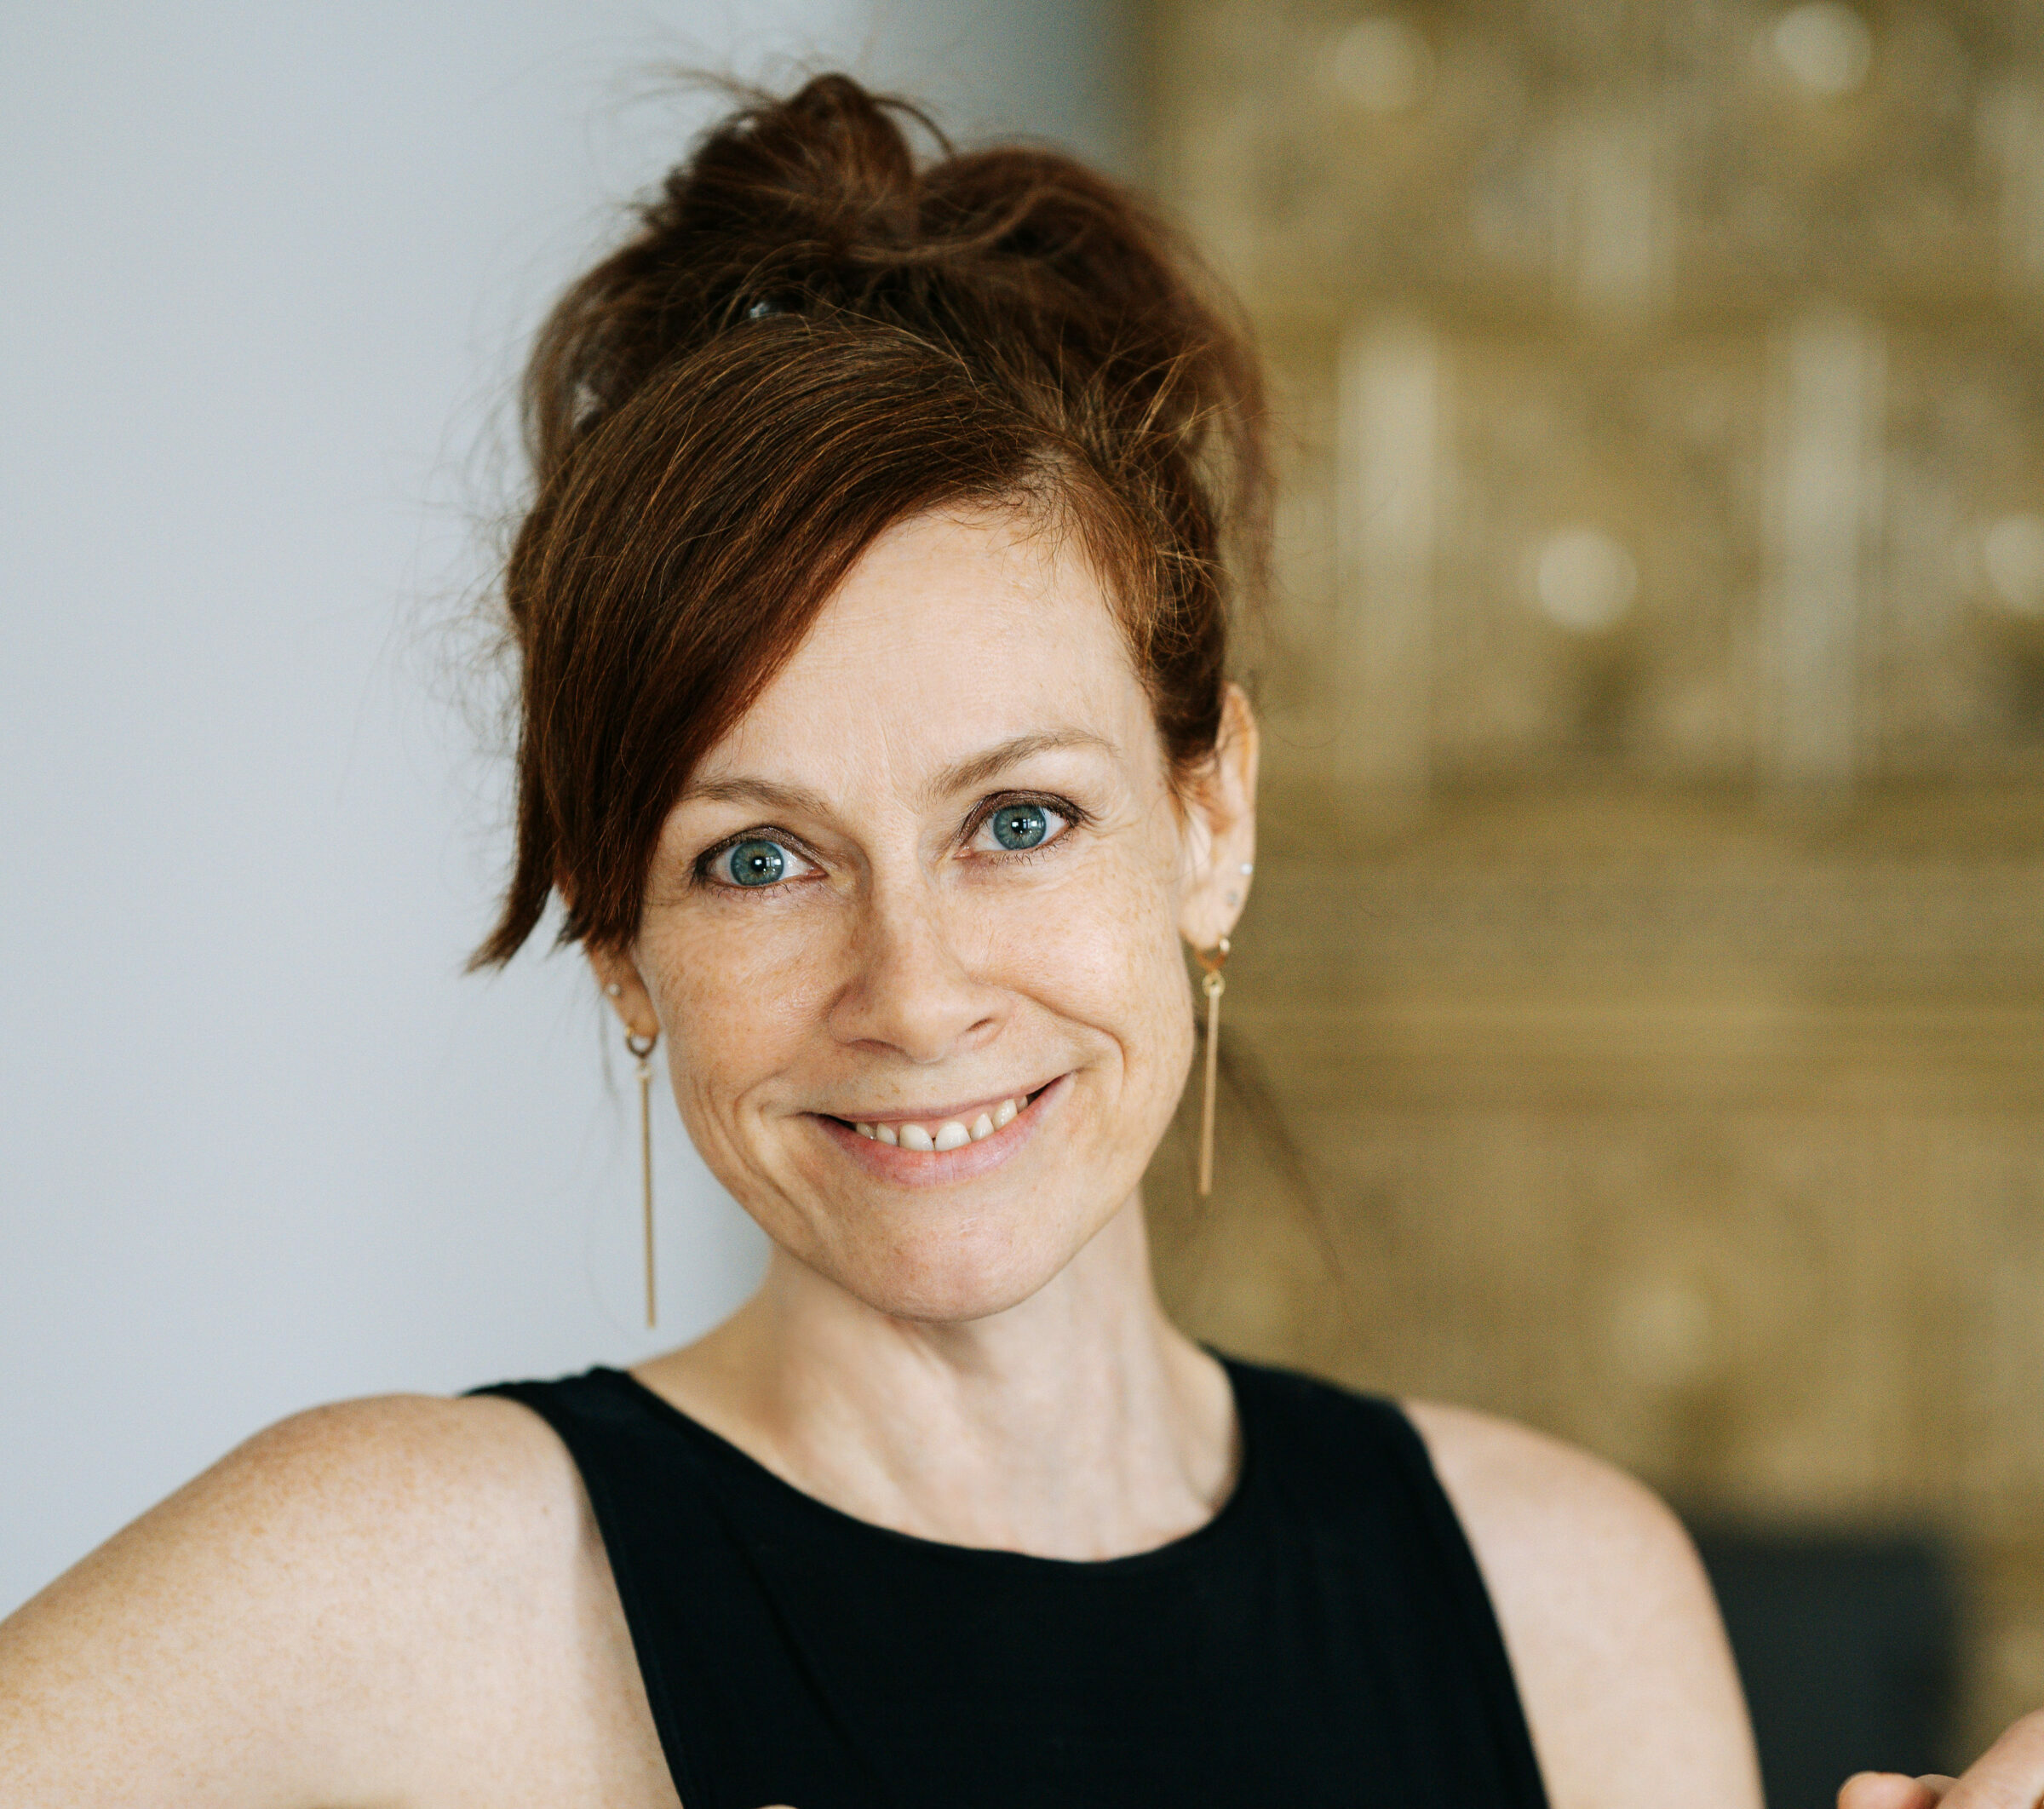 Portrait of Andrea Filseker - Vinyasa Flow and Yin Yoga teacher at RE:TREAT